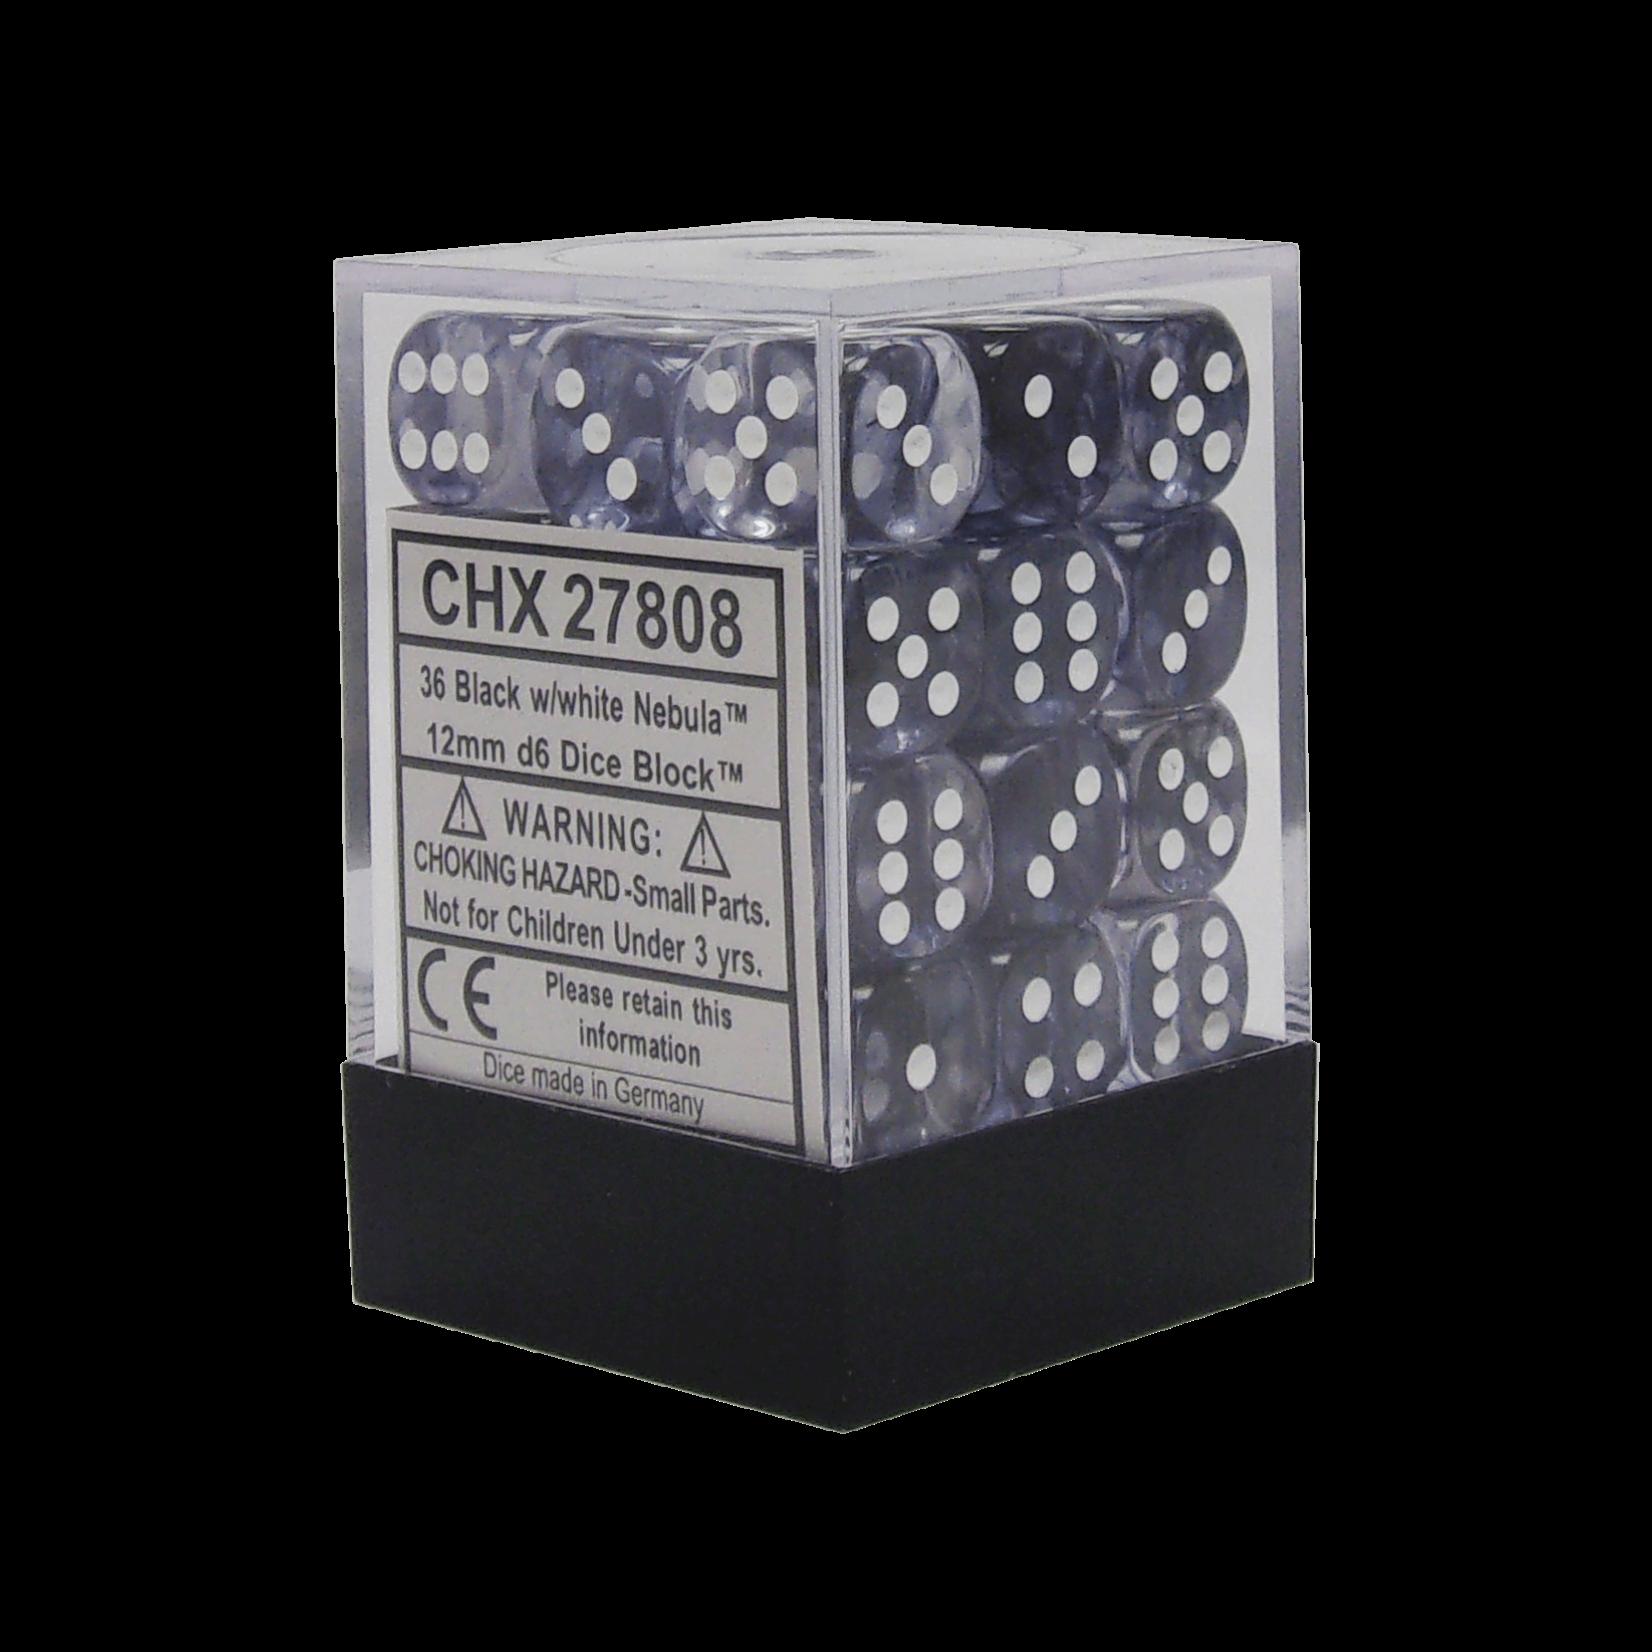 CHX 27808 Nebula Black/White (36 count)